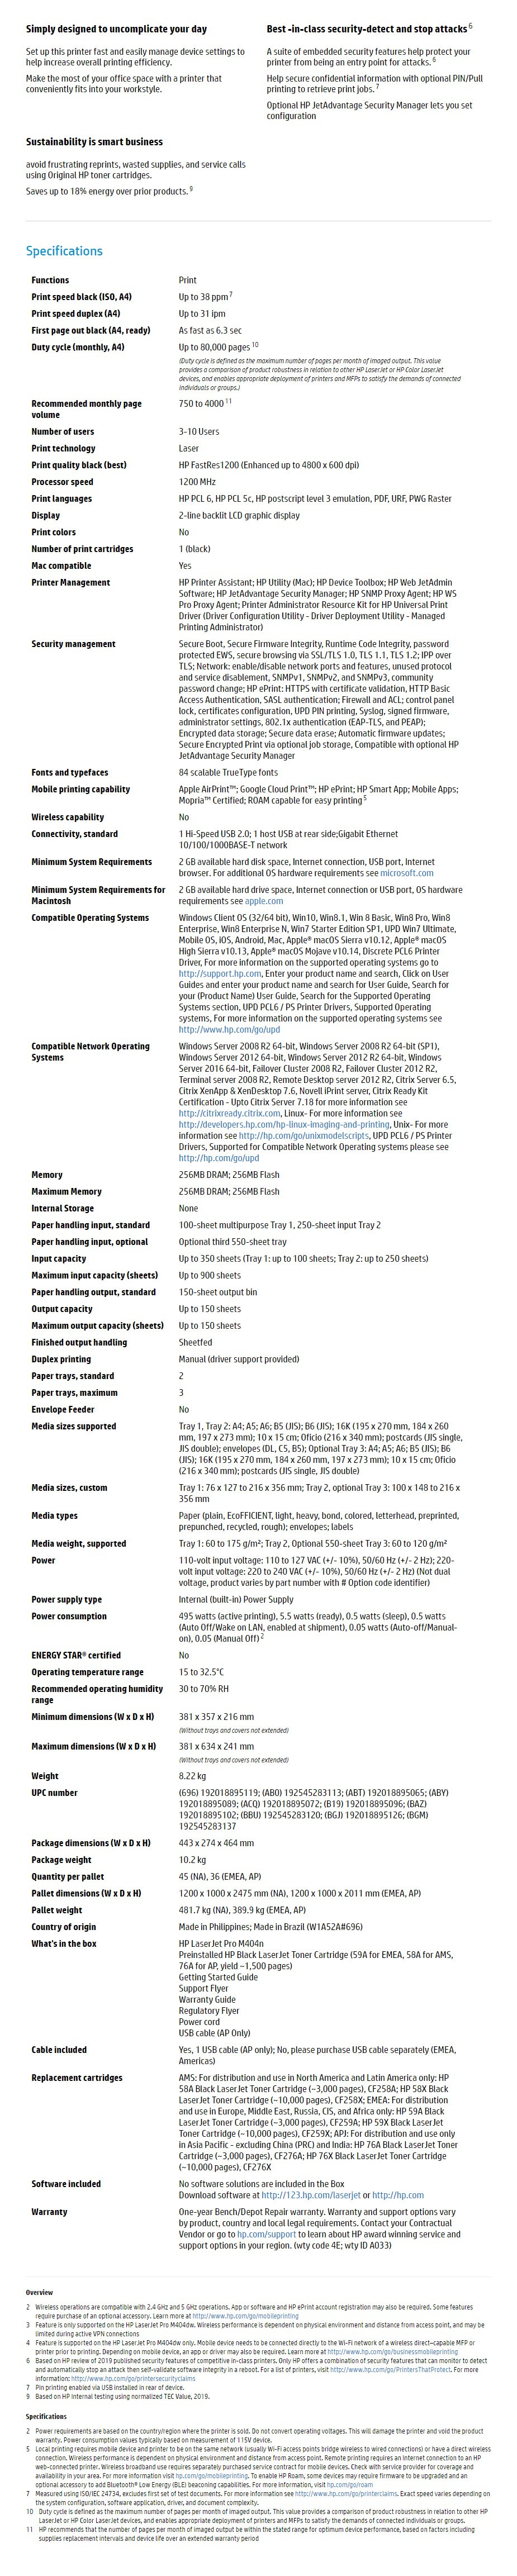 HP LaserJet Pro M404n Laser Monochrome Printer - Overview 1